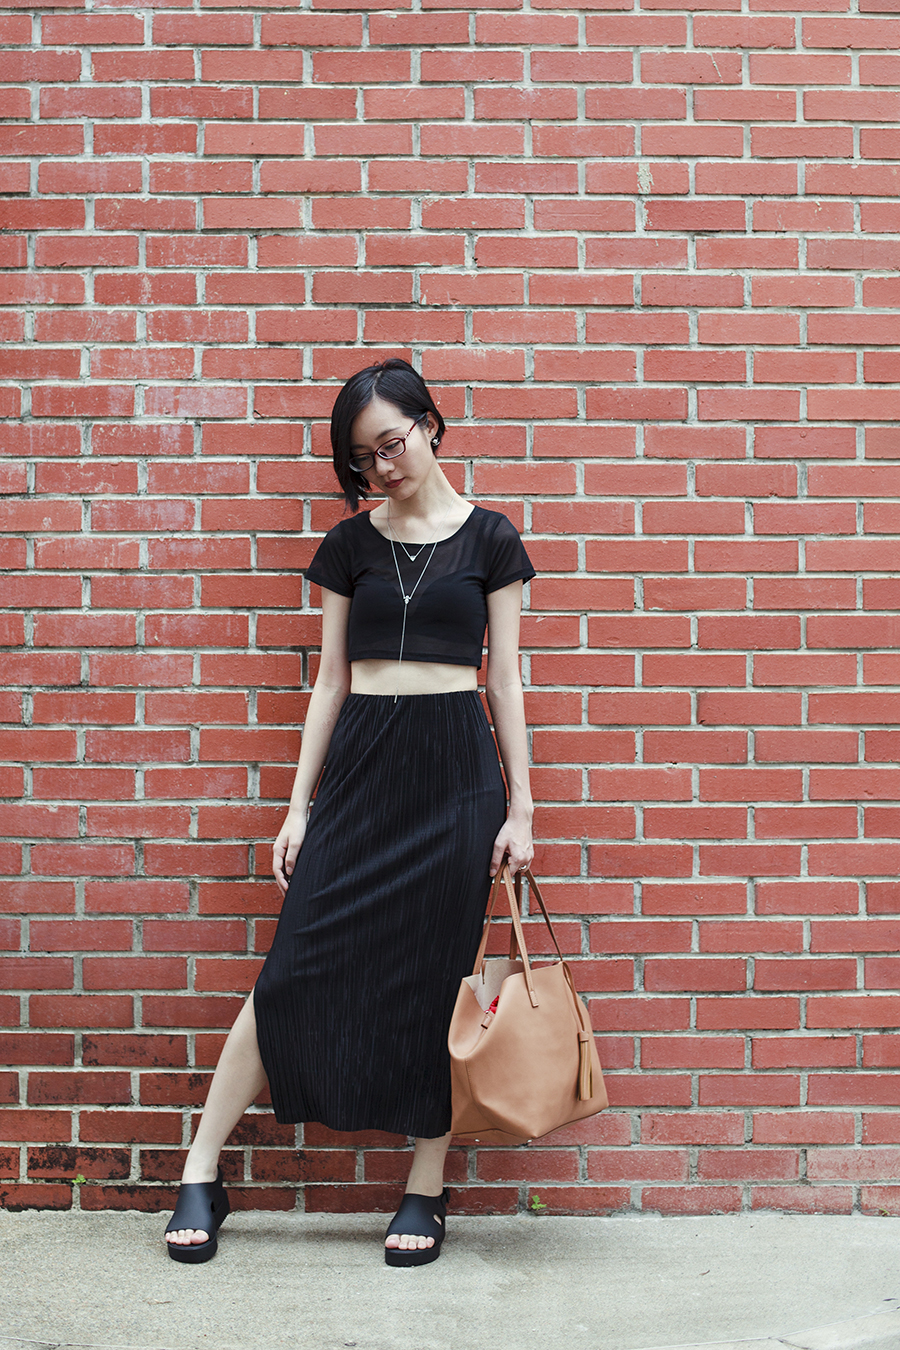 Brick wall ootd: ALDO Cocia Necklace, WholesaleBuying mesh top, Uniqlo bra, Topshop Plisse Ankle Grazer Skirt, Melissa Hotness Platform Sandals, Mango Shopper Bag, Firmoo red glasses.